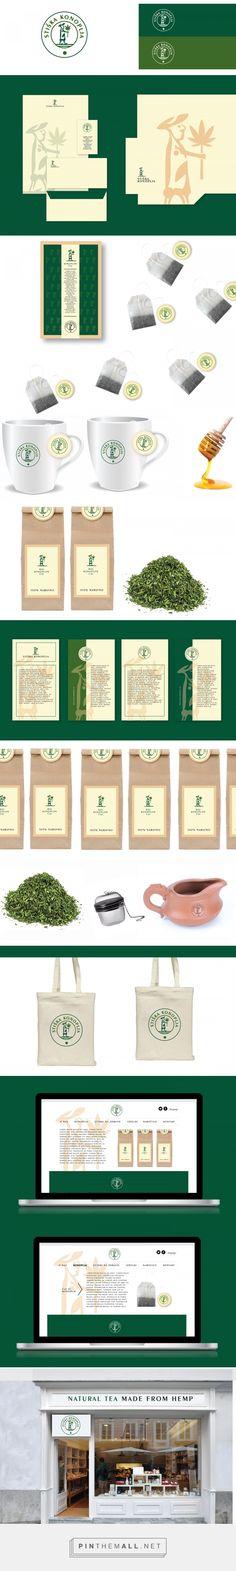 Stiska Konoplja Hemp Tea Branding and Packaging by Gregor Ivanusic   Fivestar Branding Agency – Design and Branding Agency & Curated Inspiration Gallery